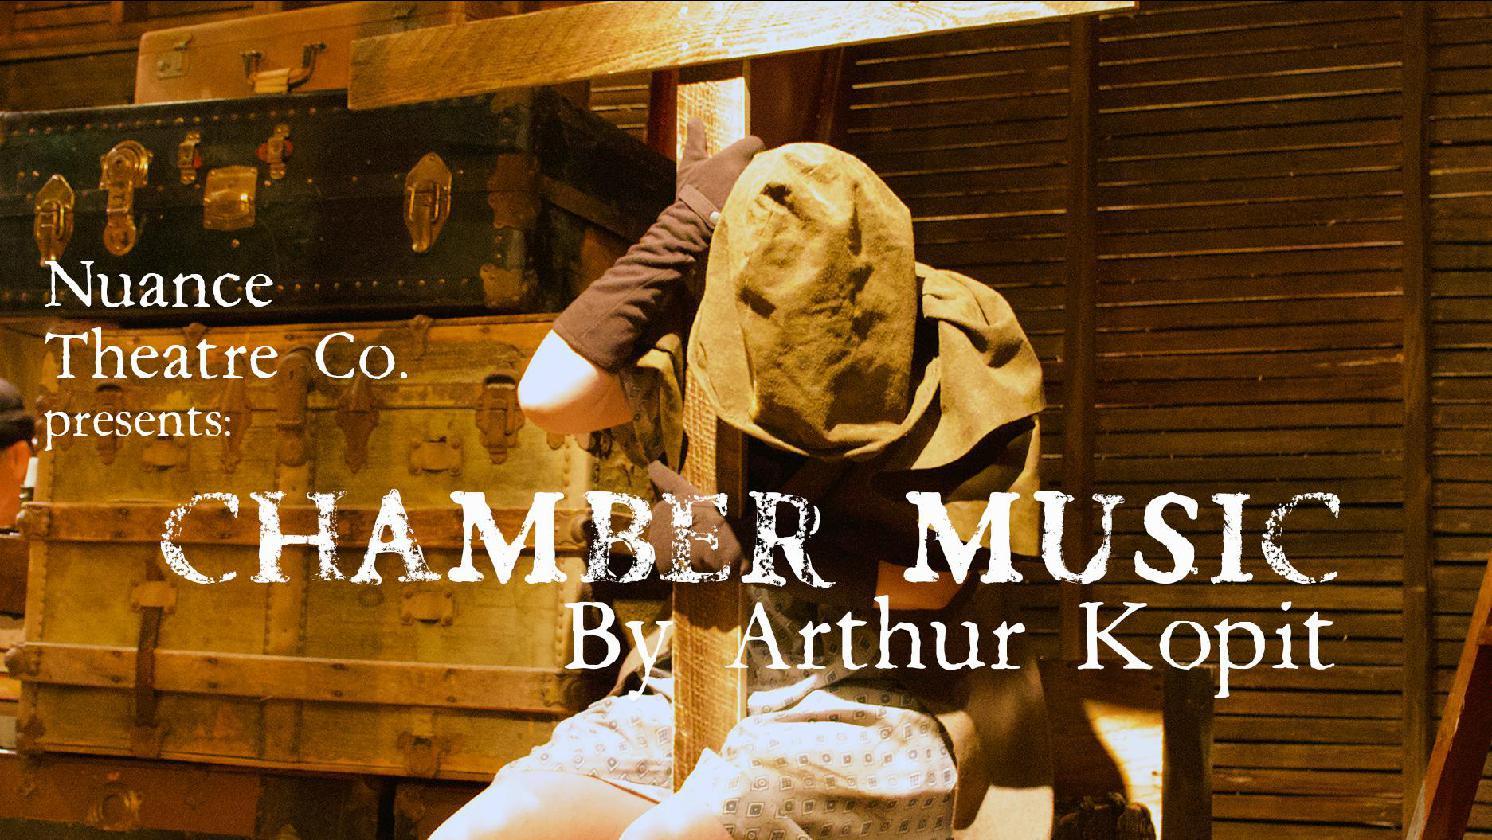 CHAMBER MUSIC by Arthur Kopit